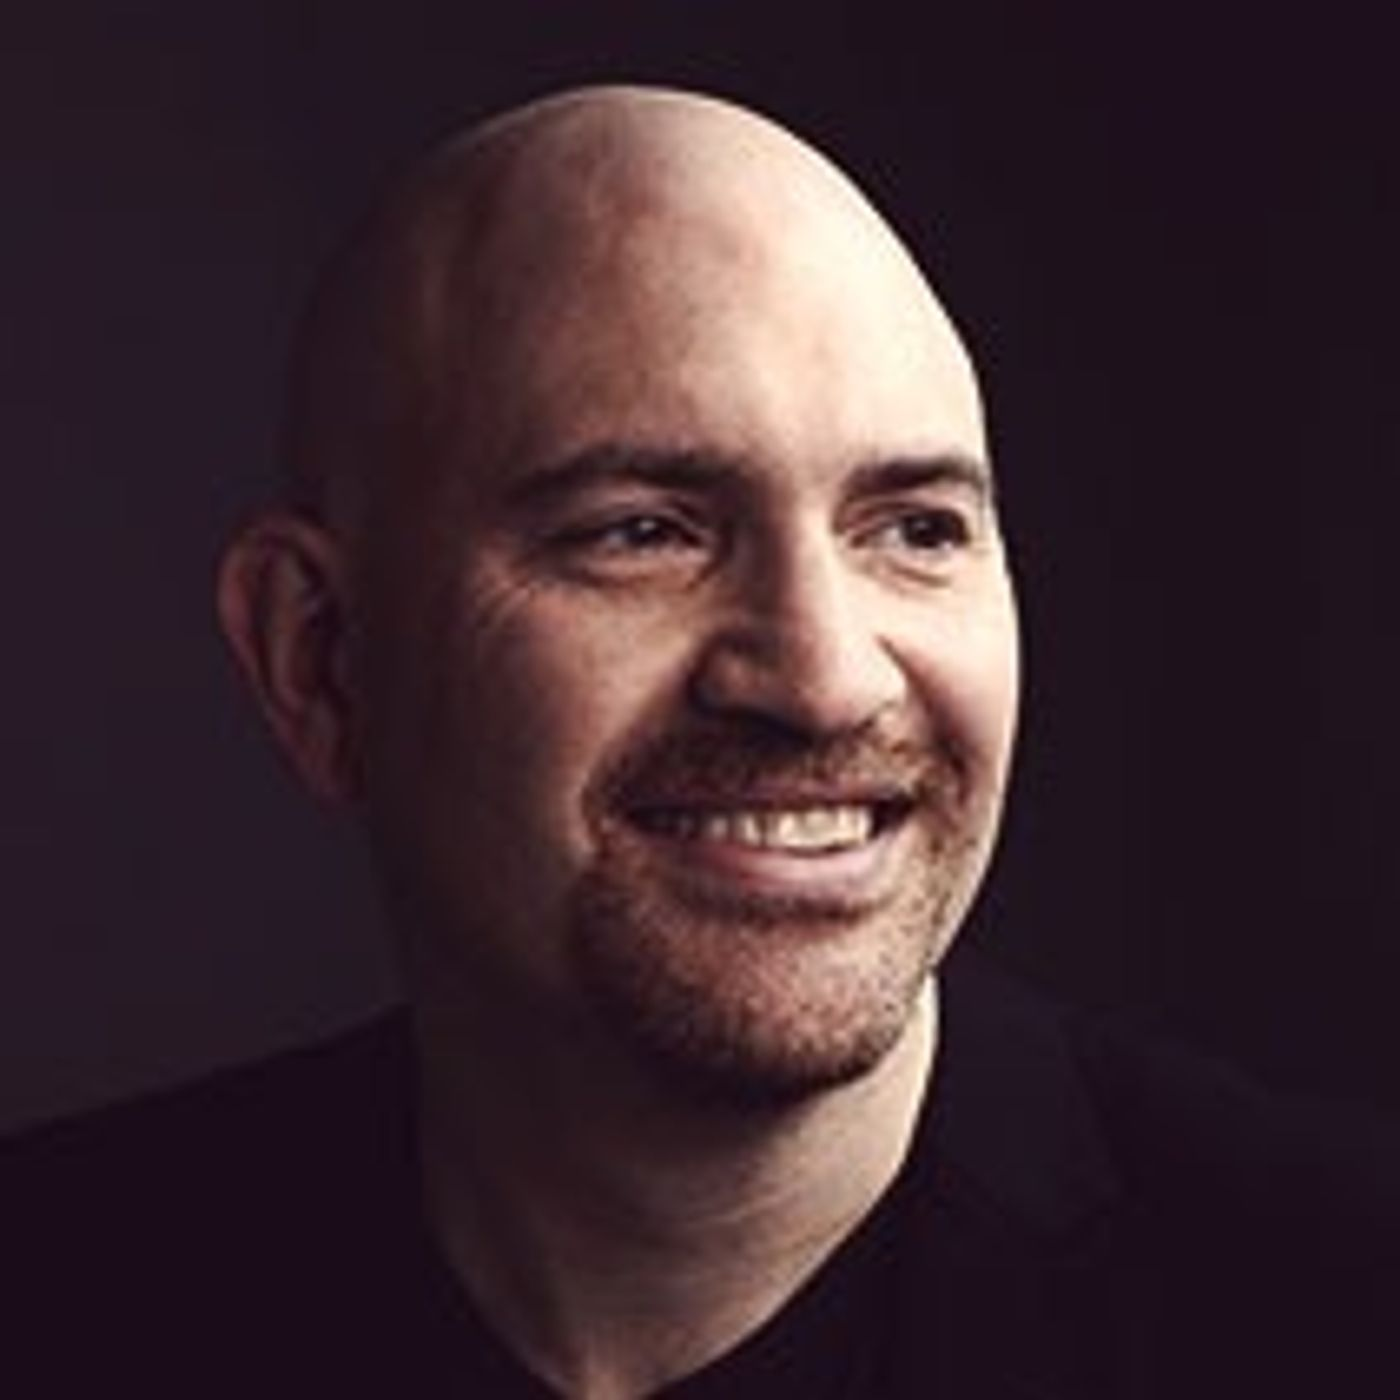 Scaling the Metaverse with Roblox CTO Daniel Sturman